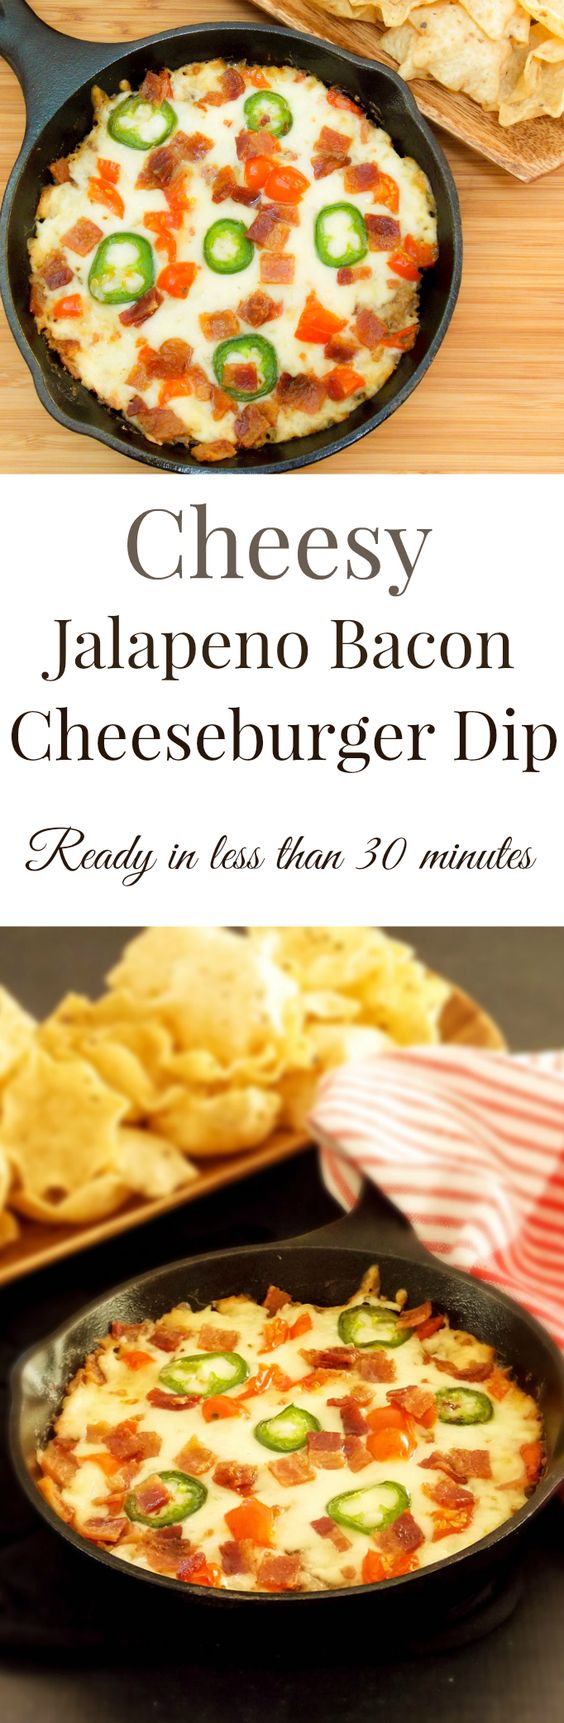 gooey cheeseburger dip recipes dishmaps gooey cheeseburger dip ...